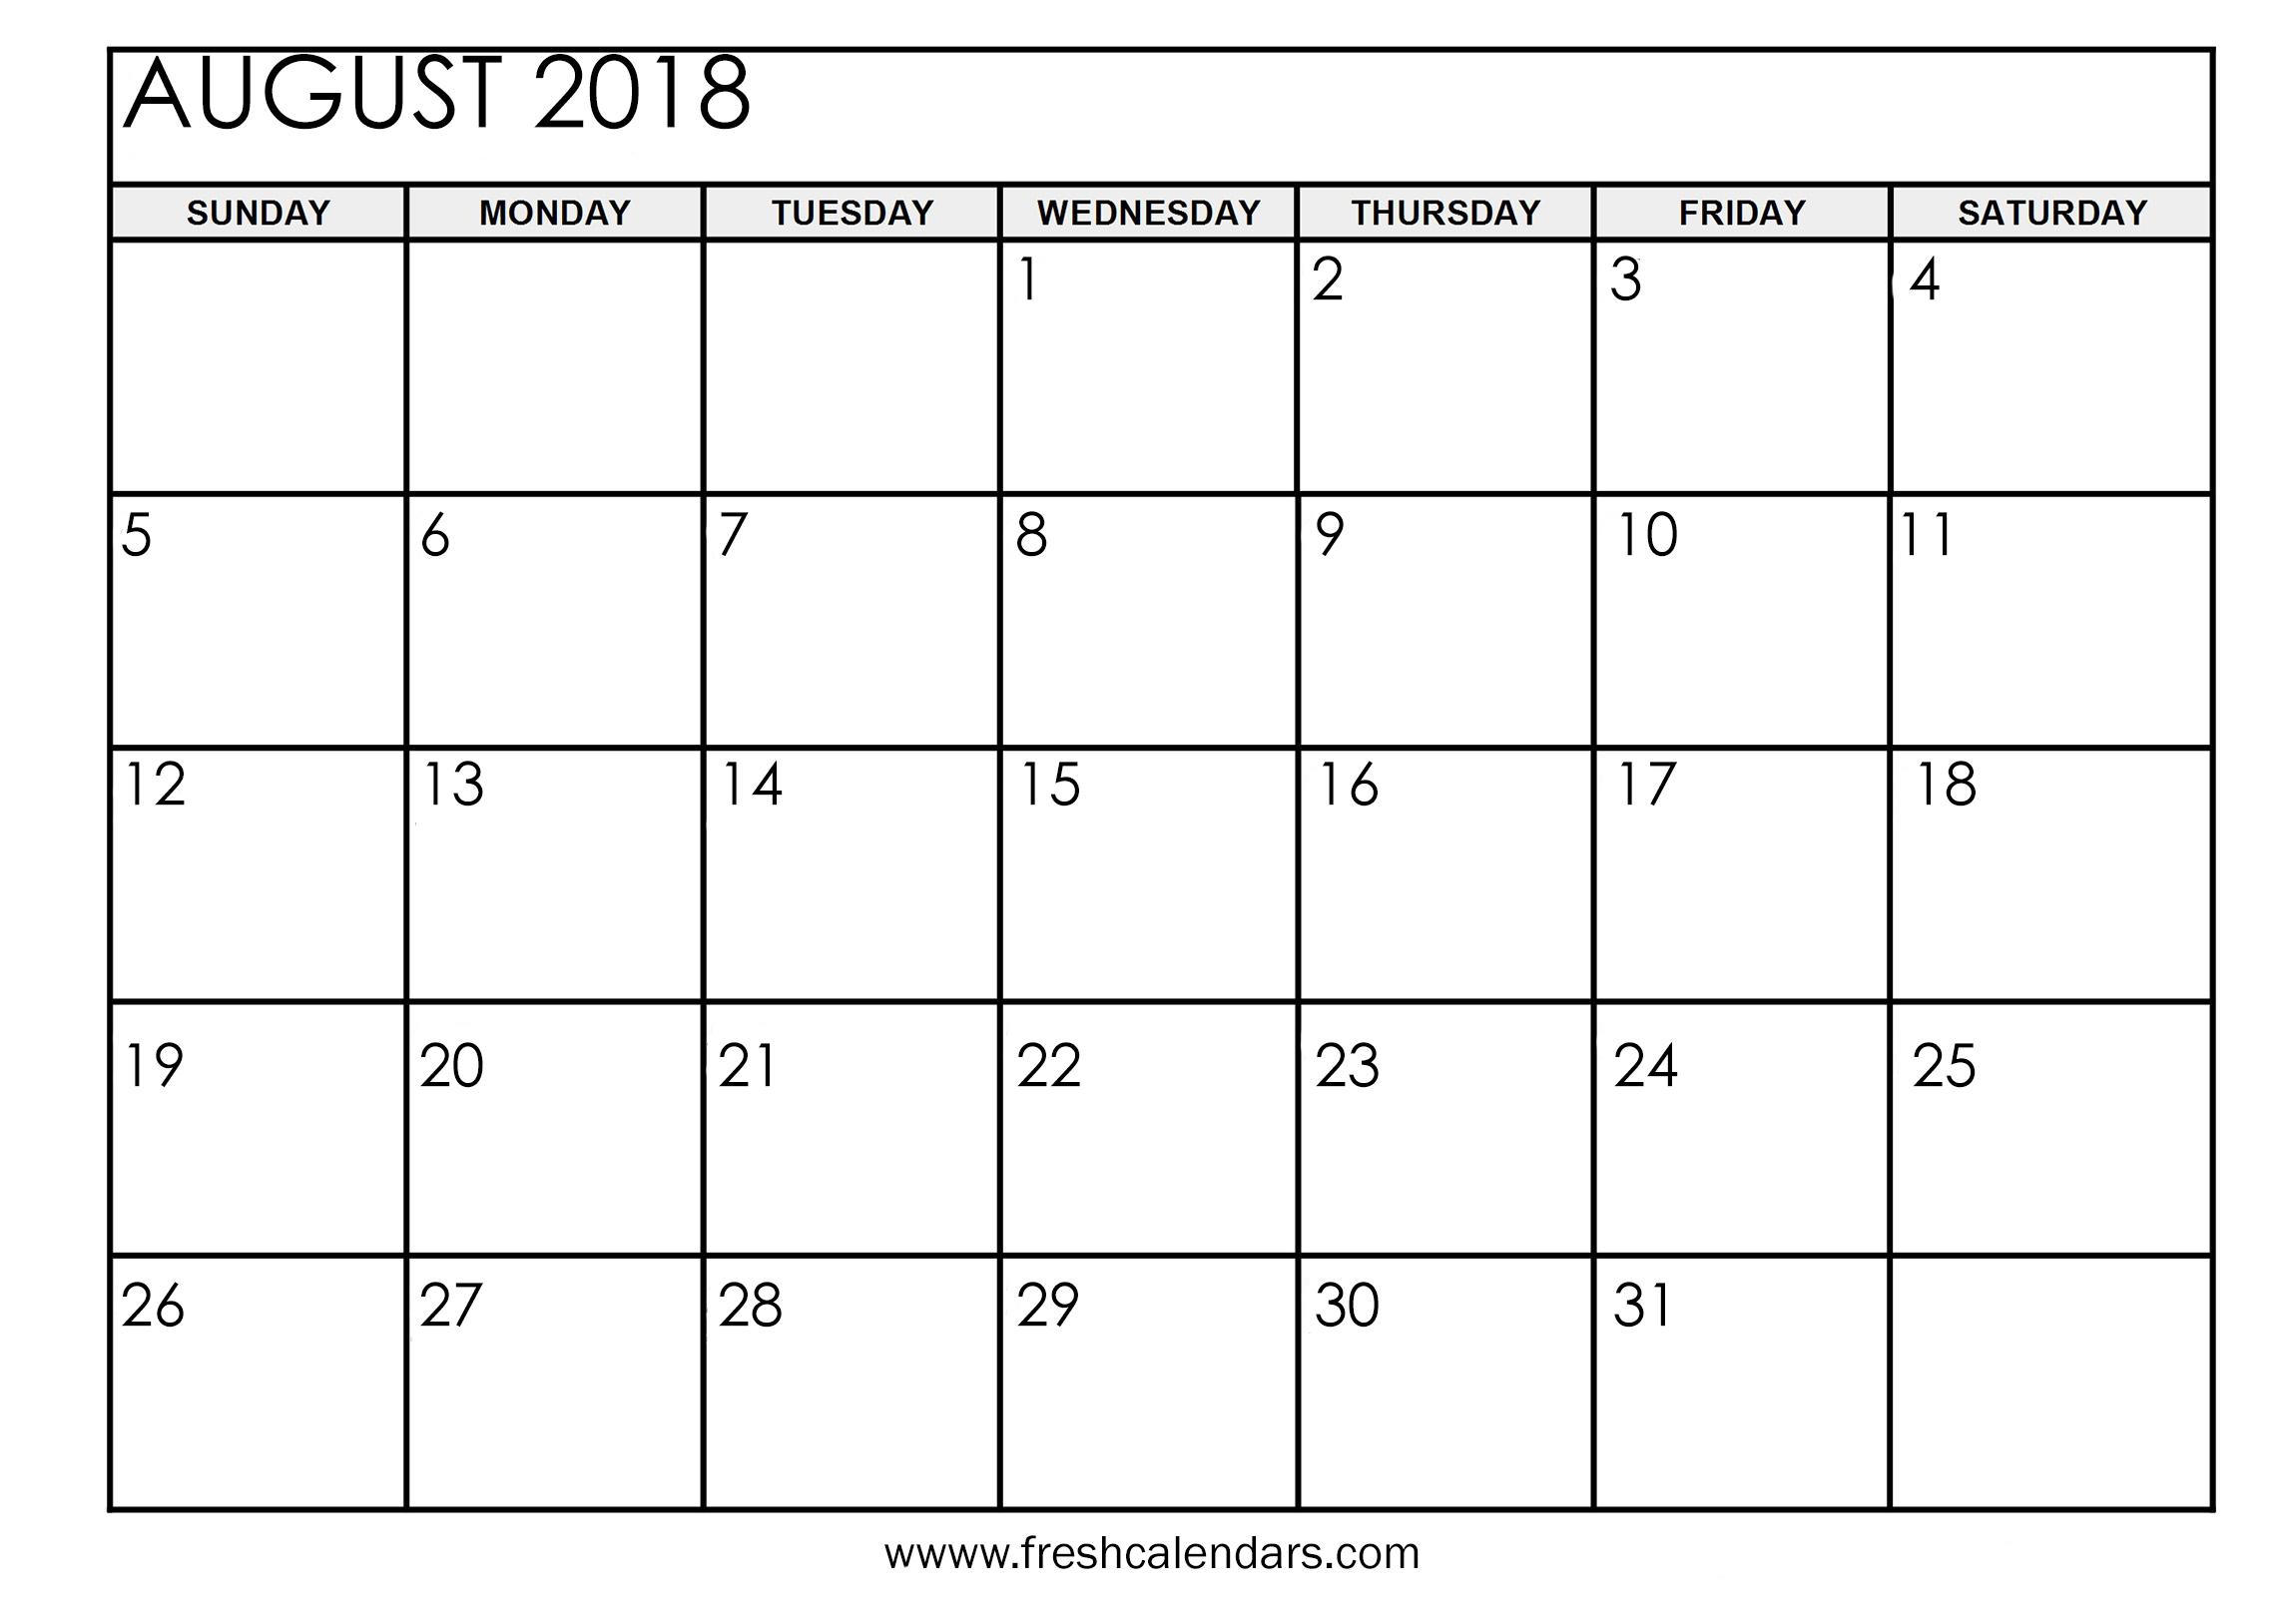 August 2018 Calendar Printable - Fresh Calendars regarding Blank August Colorful Calendar